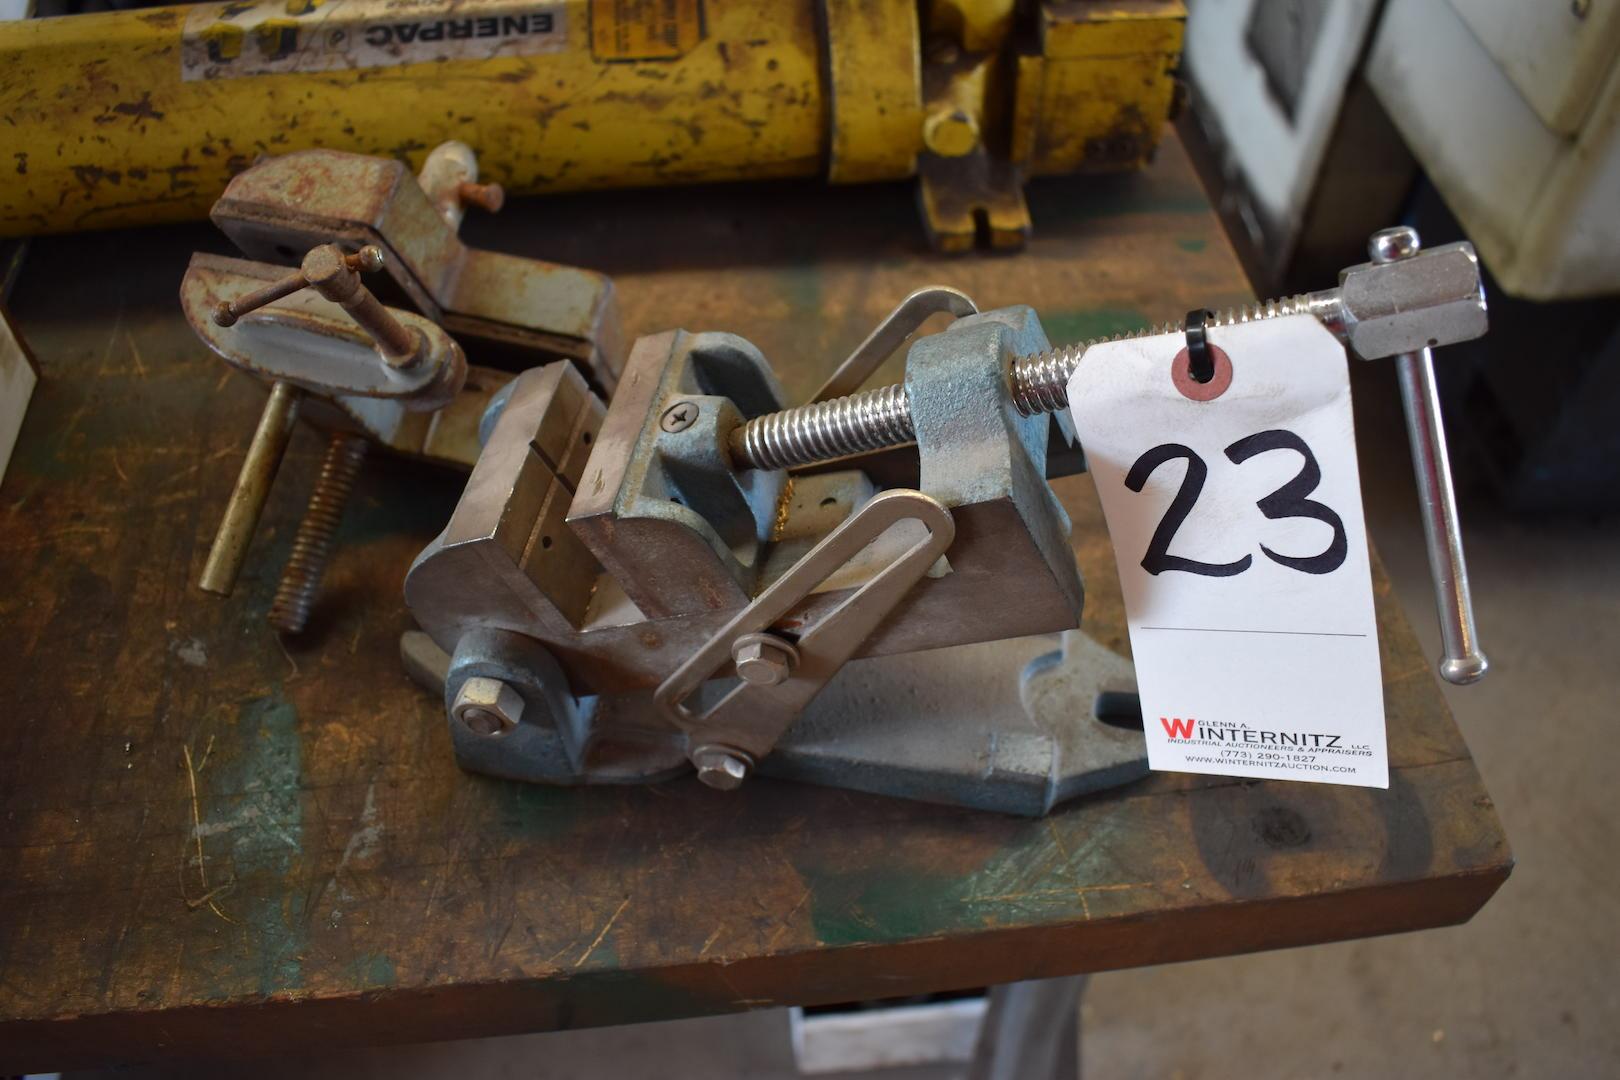 Lot 23 - LOT: Wilton Angle Vise & Stanley No. 700 Vise